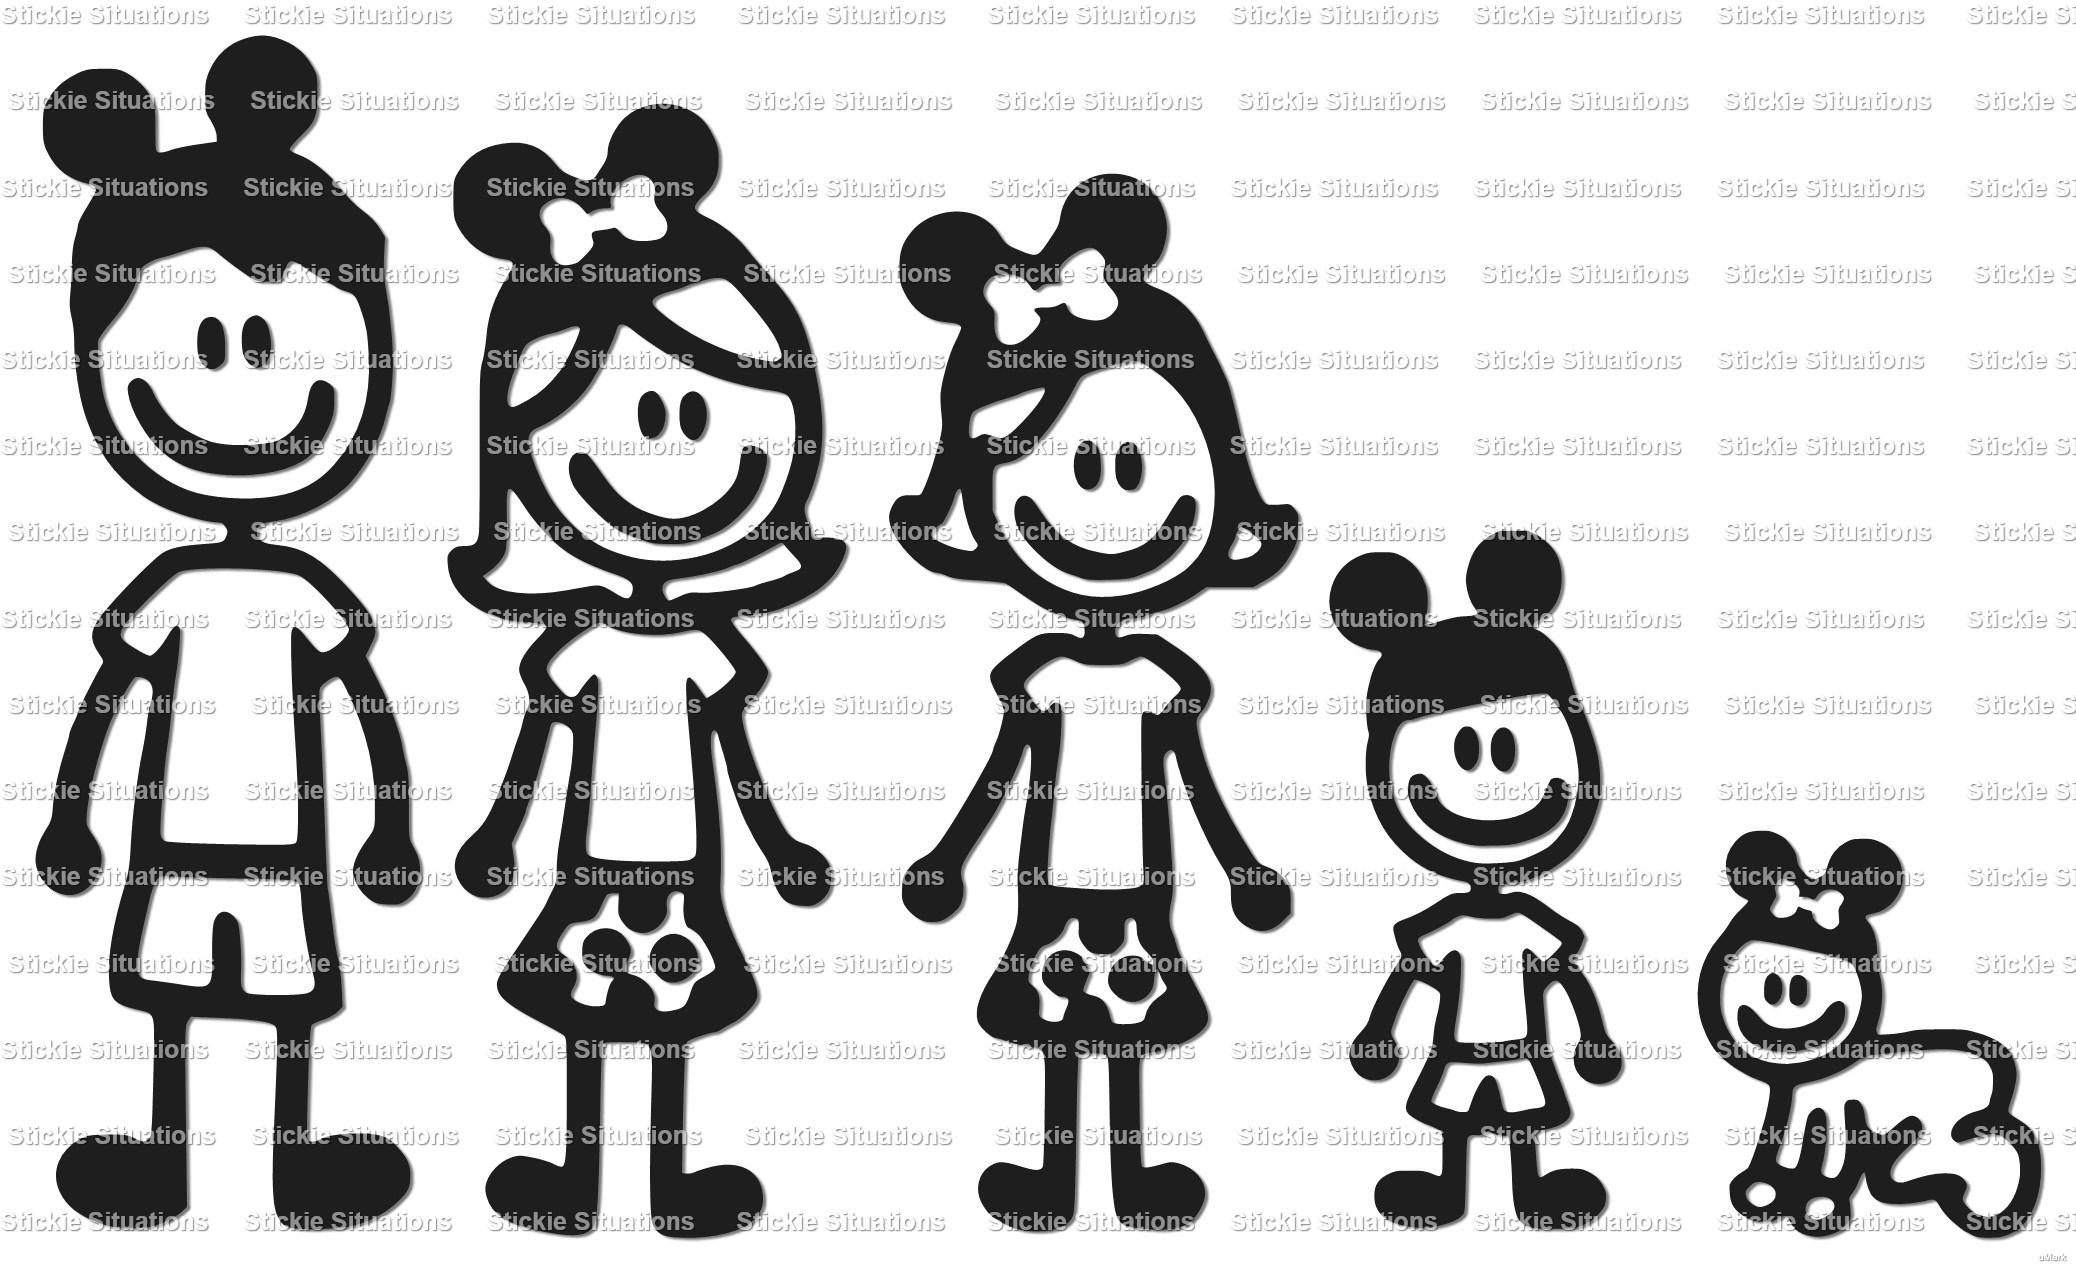 Design a car decal online - Disney Family Car Decal Design 2